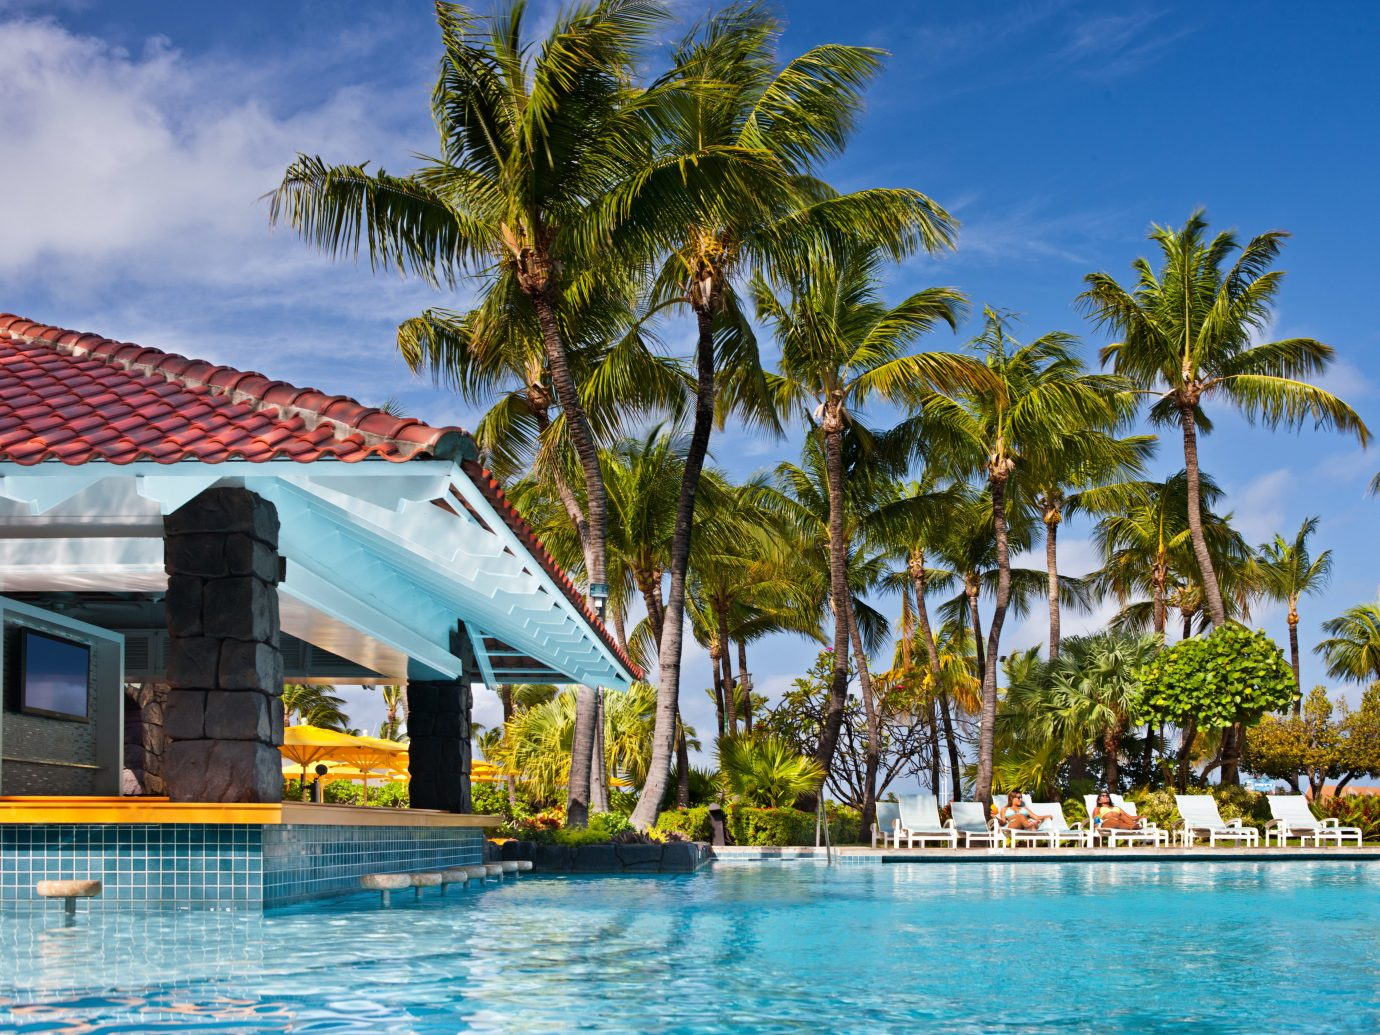 Aruba Beachfront Casino Classic Hotels Pool Resort Tropical outdoor tree sky water swimming pool leisure caribbean vacation arecales Beach estate Sea resort town tropics Lagoon bay Island palm swimming